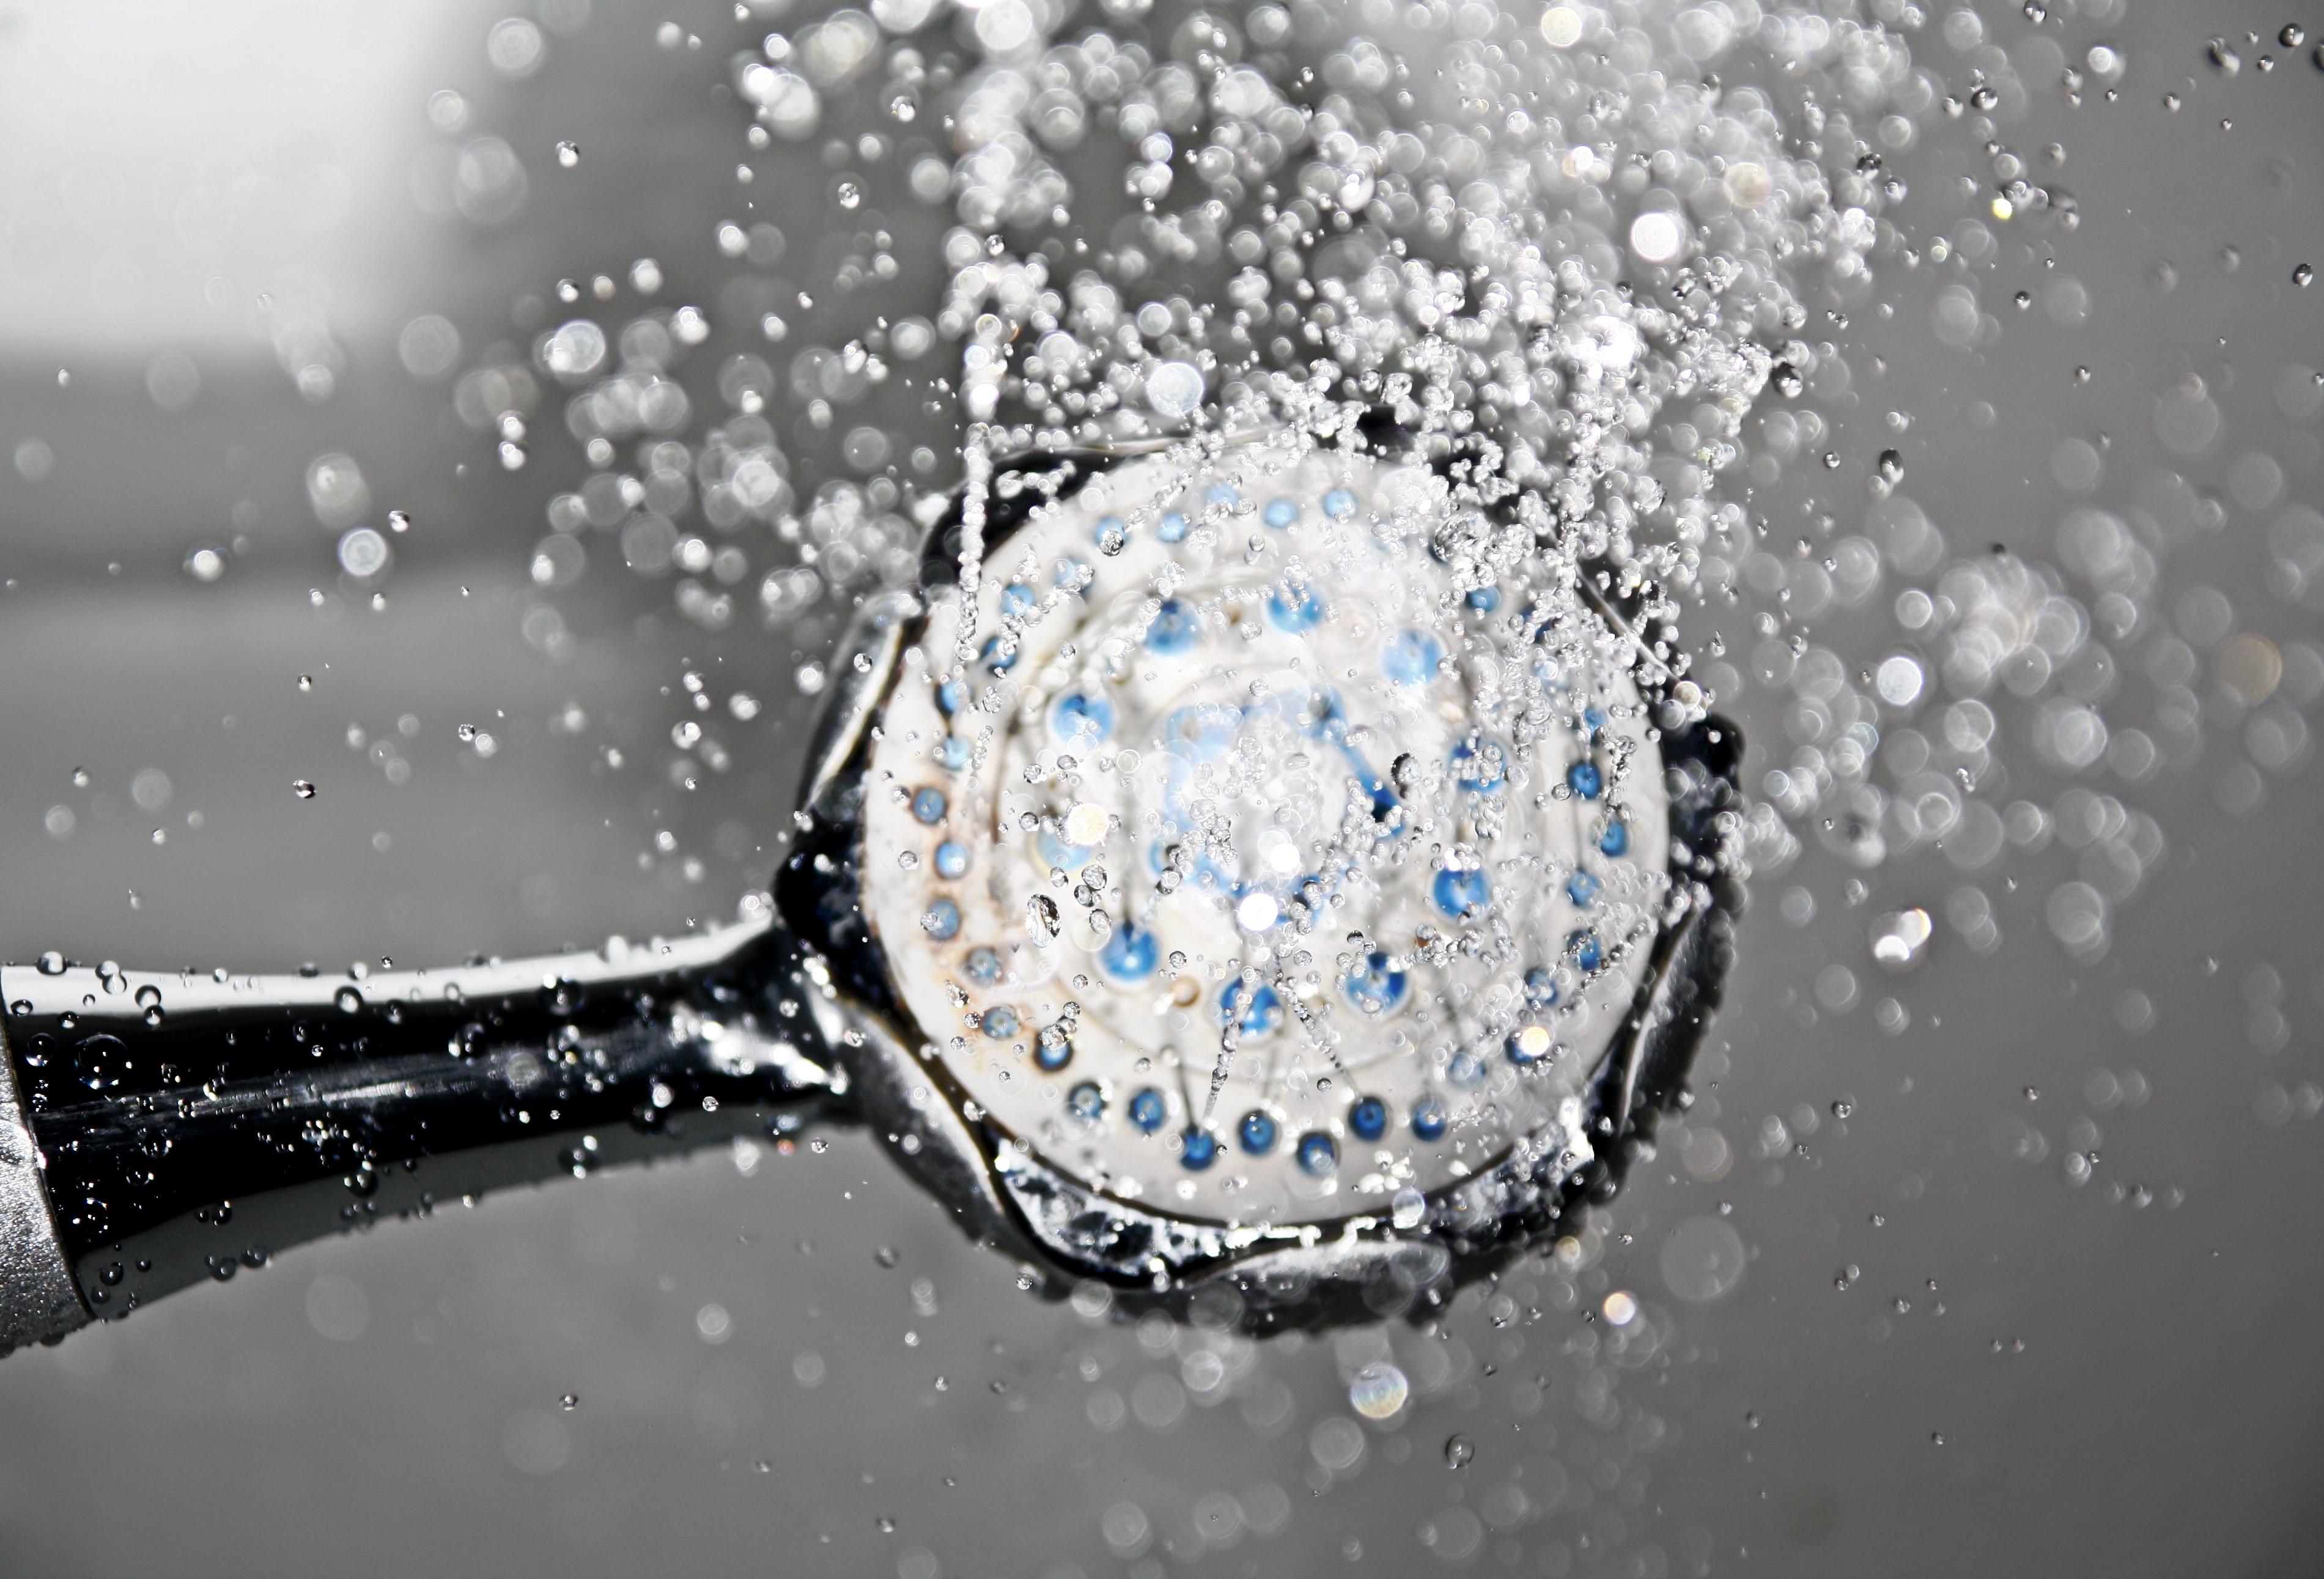 Shower - Legionella Risk Assessment